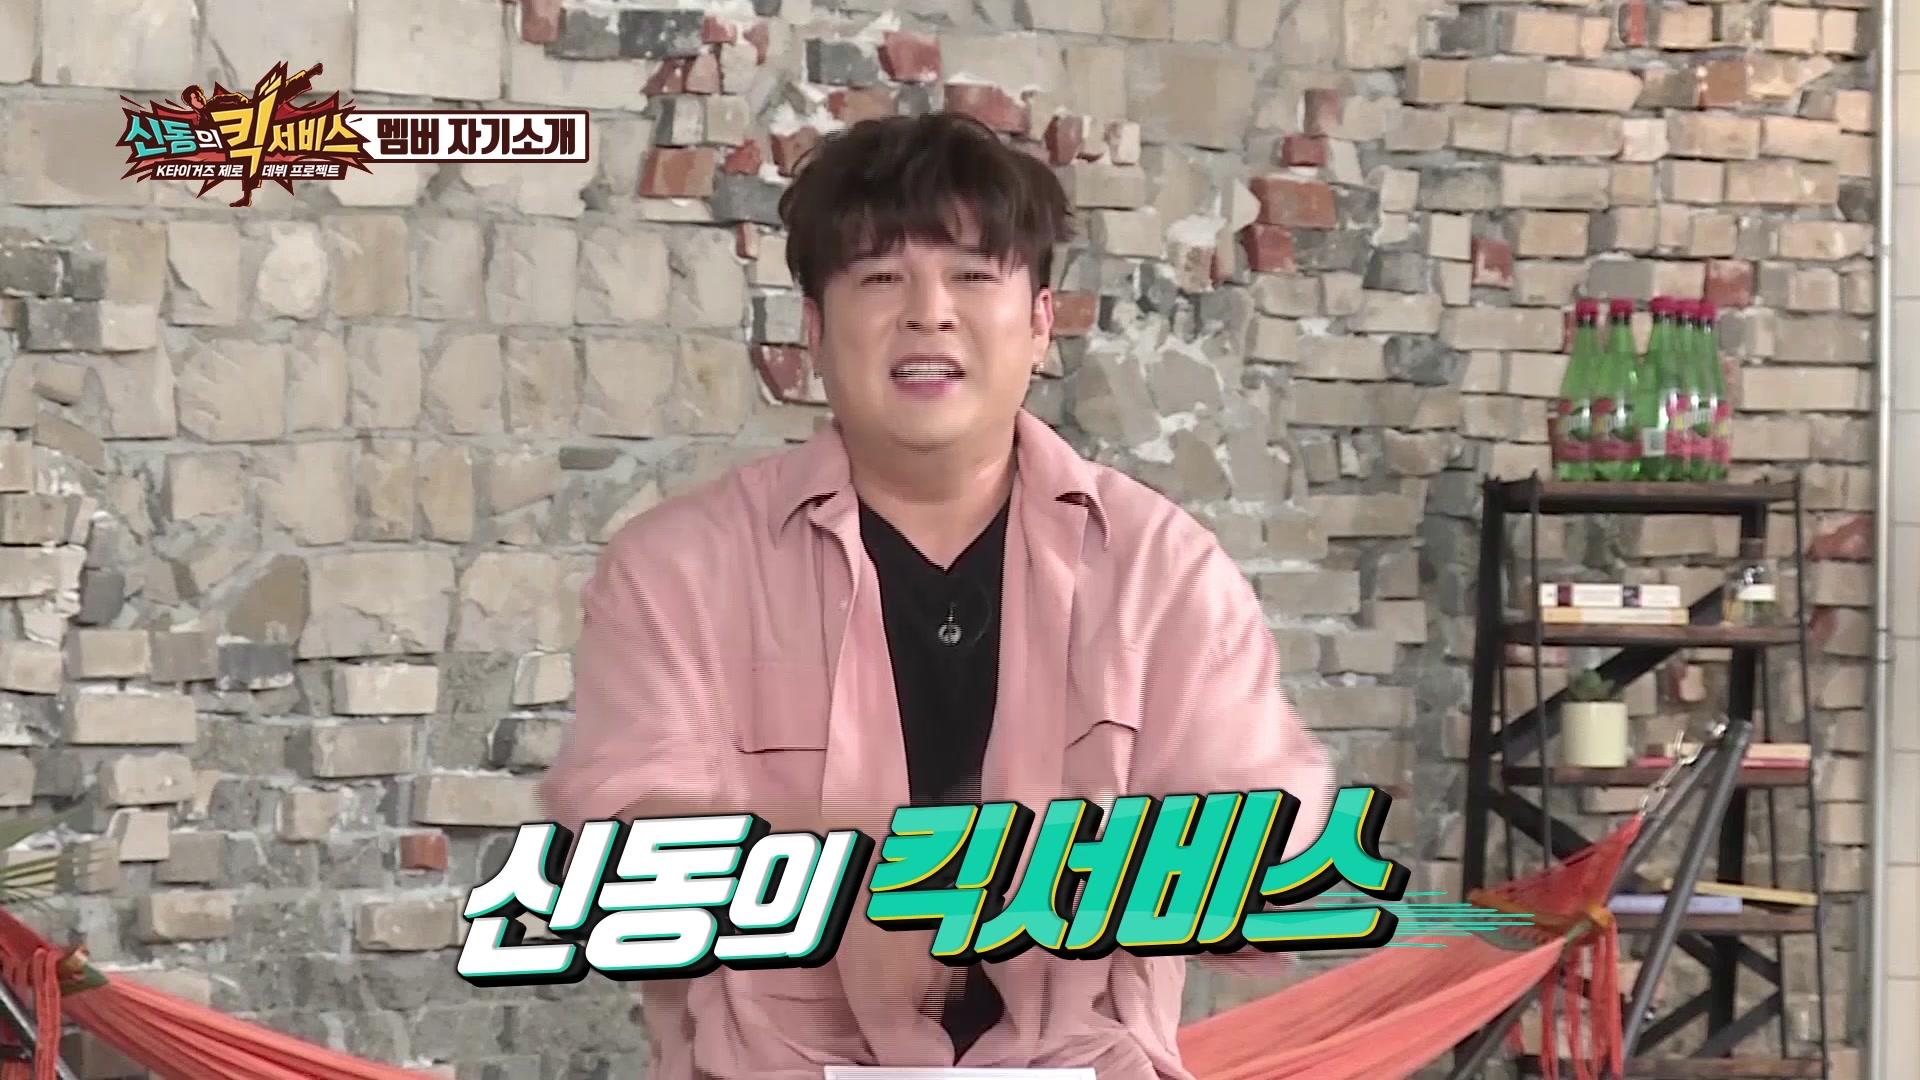 Shindong's Kick Service Episode 1